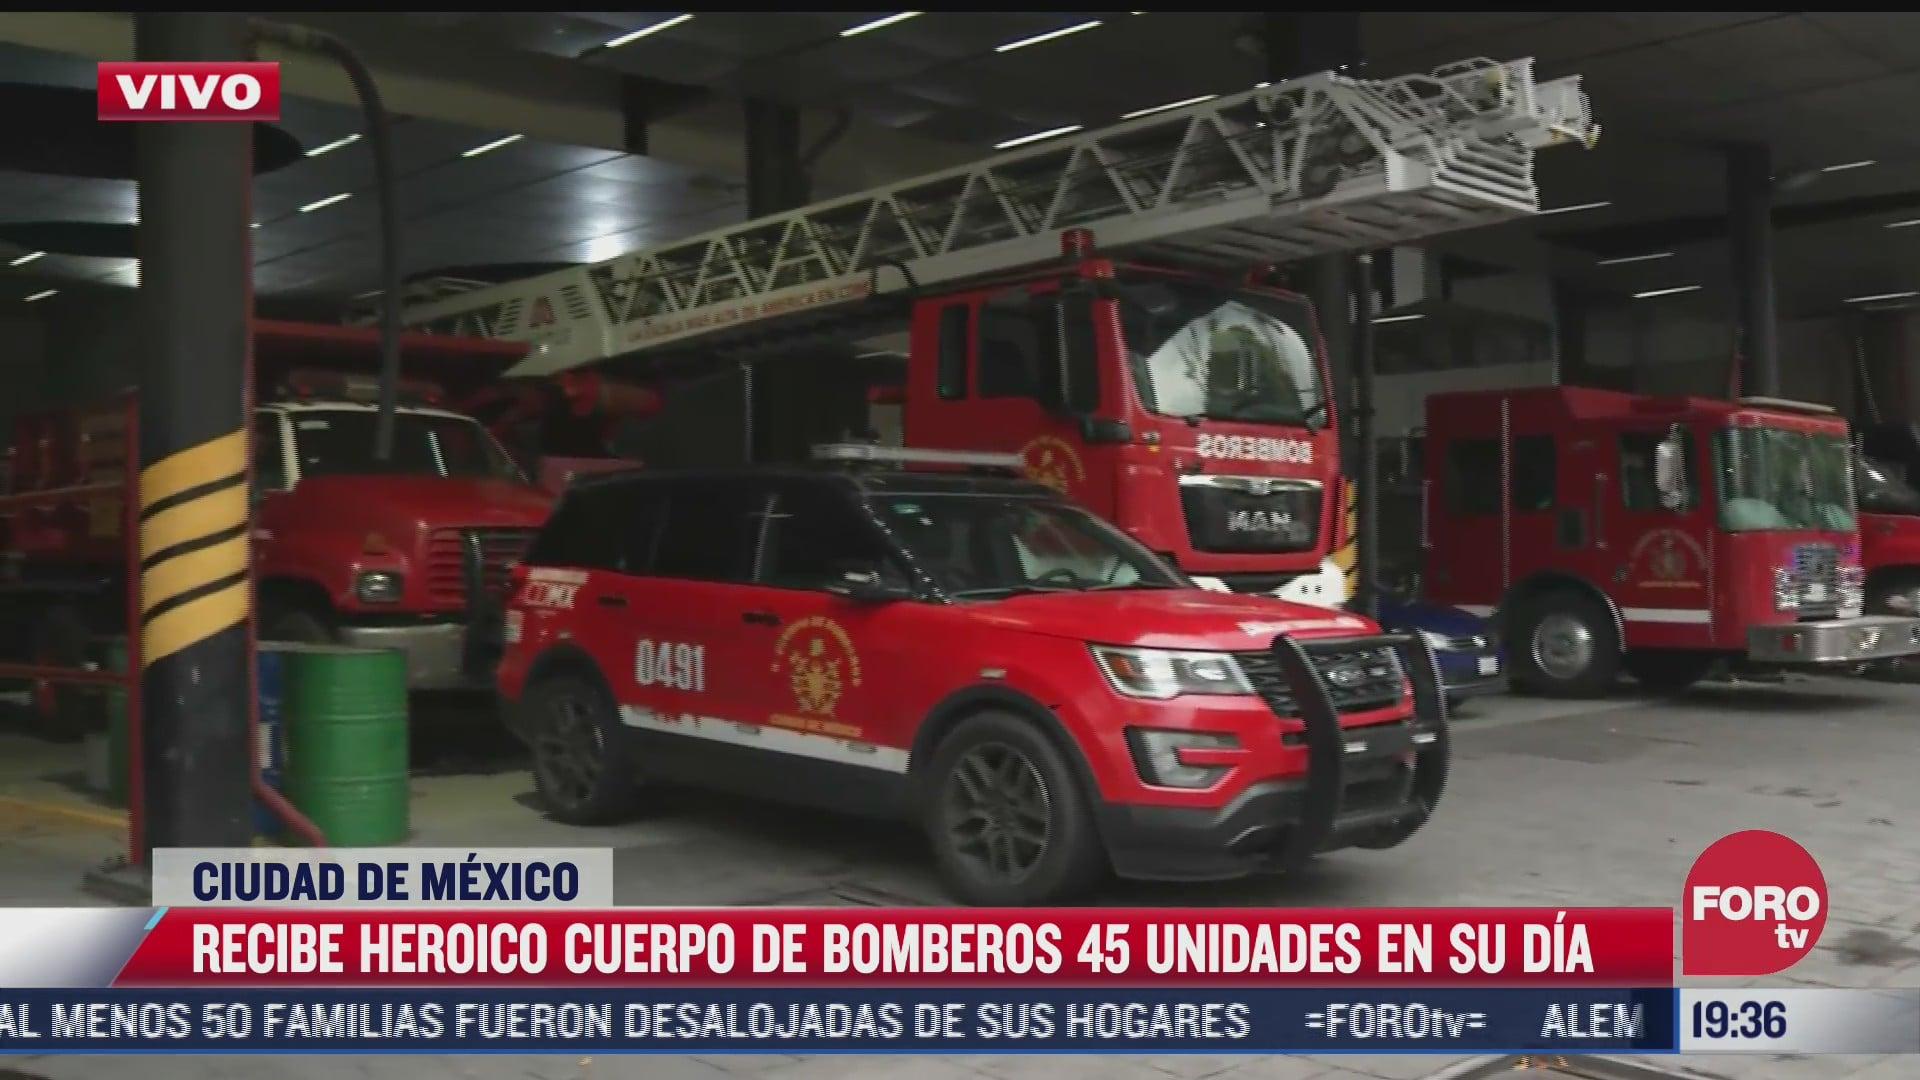 bomberos en cdmx reciben 45 unidades